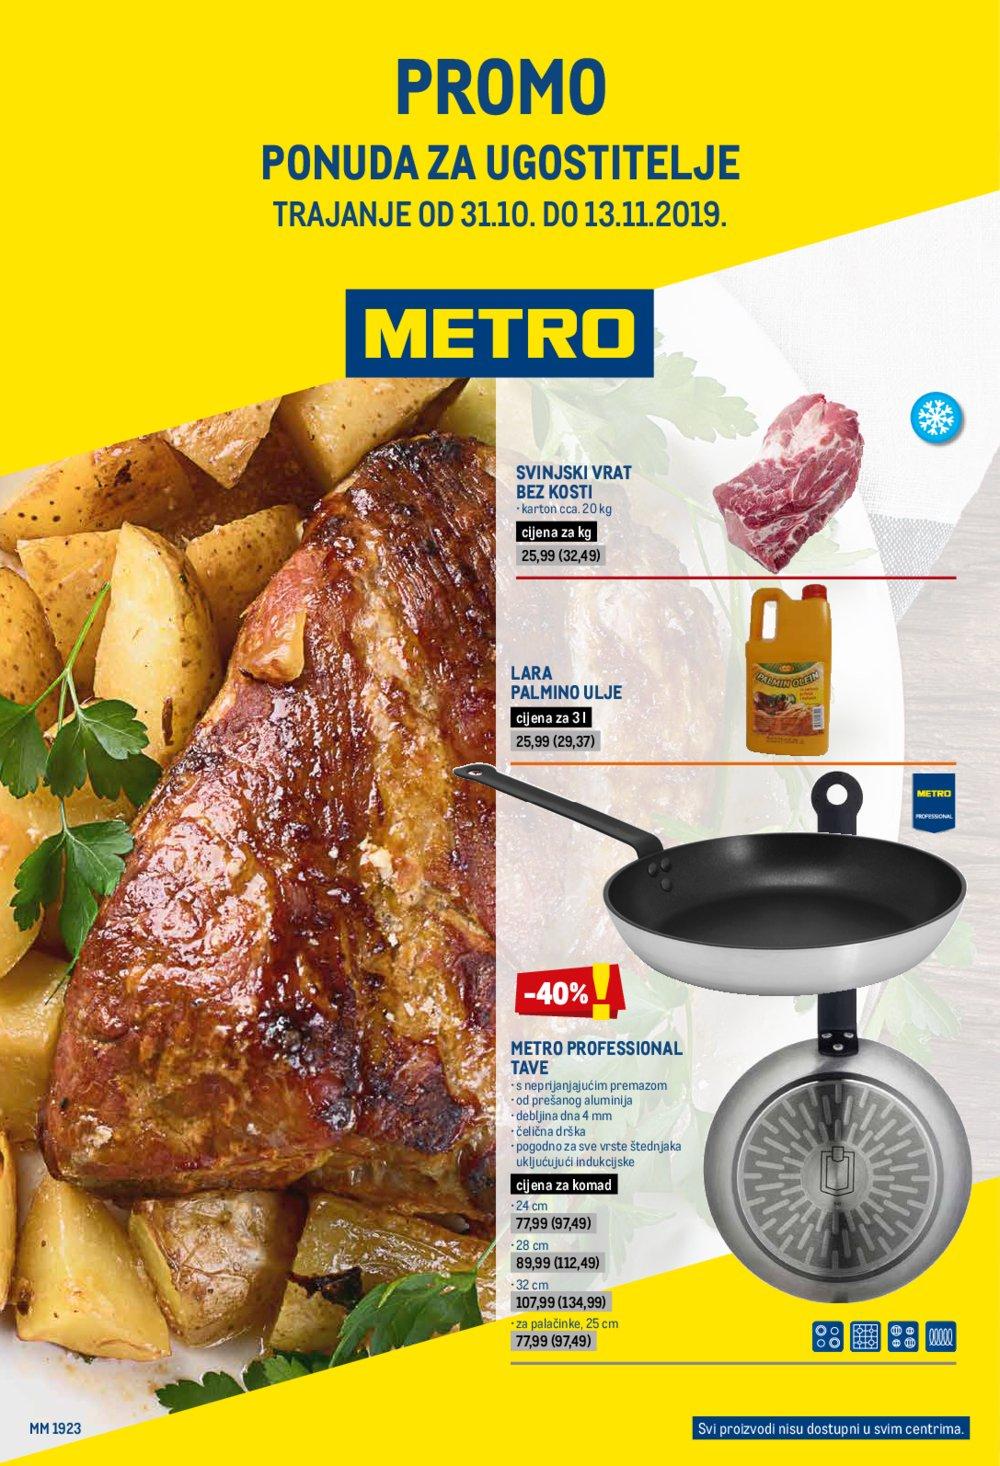 Metro katalog Akcija Ponuda za ugostitelje 31.10.-13.11.2019.